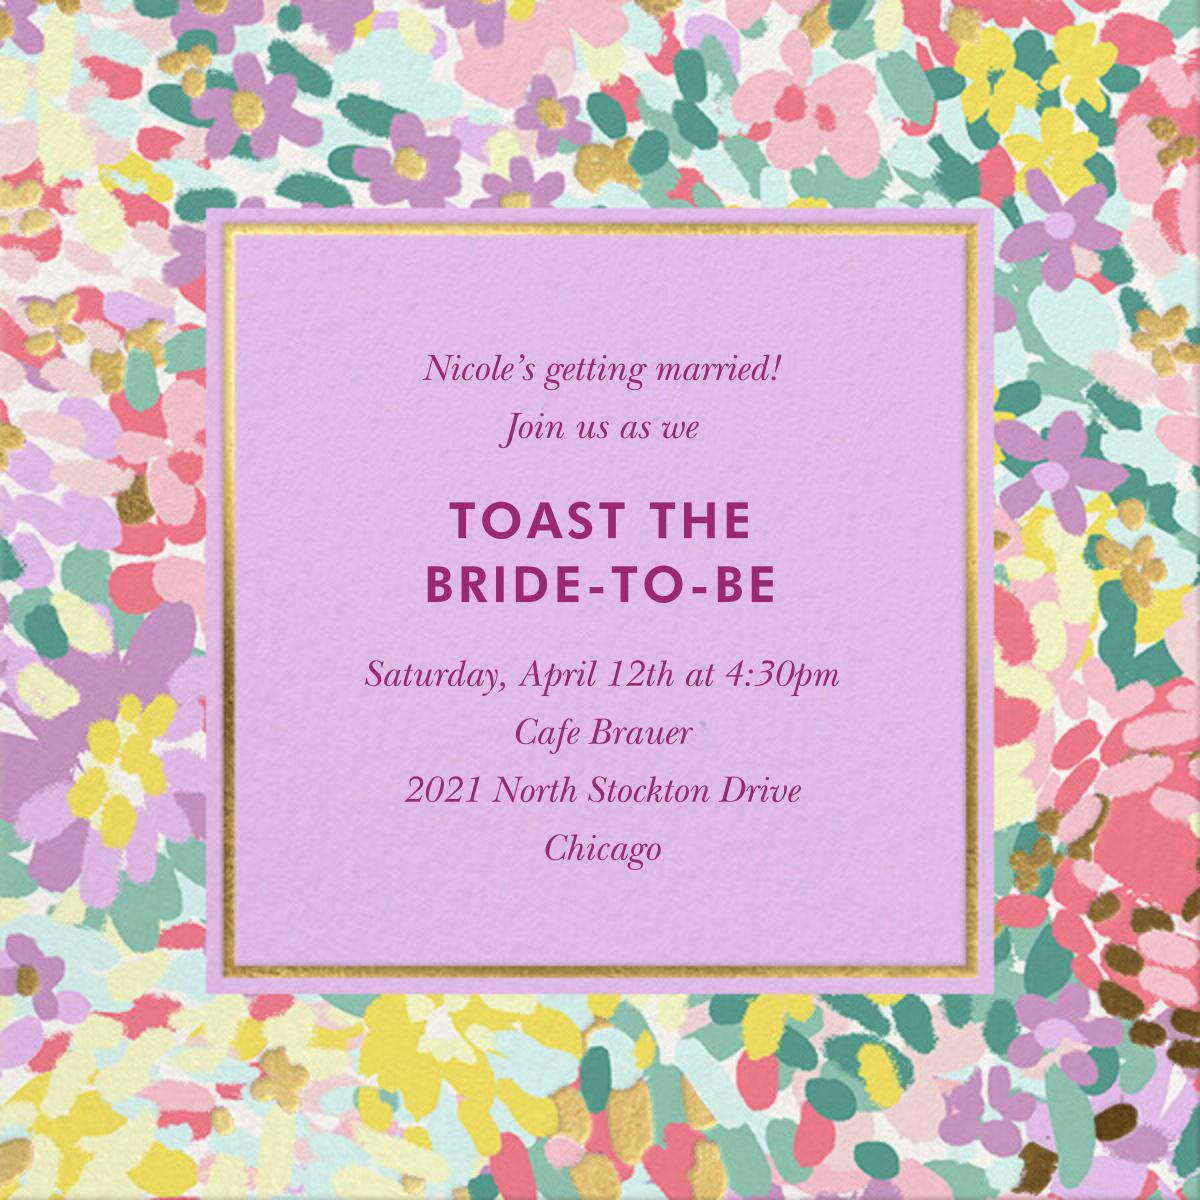 Painted Posies - Wisteria - kate spade new york - Bridal shower